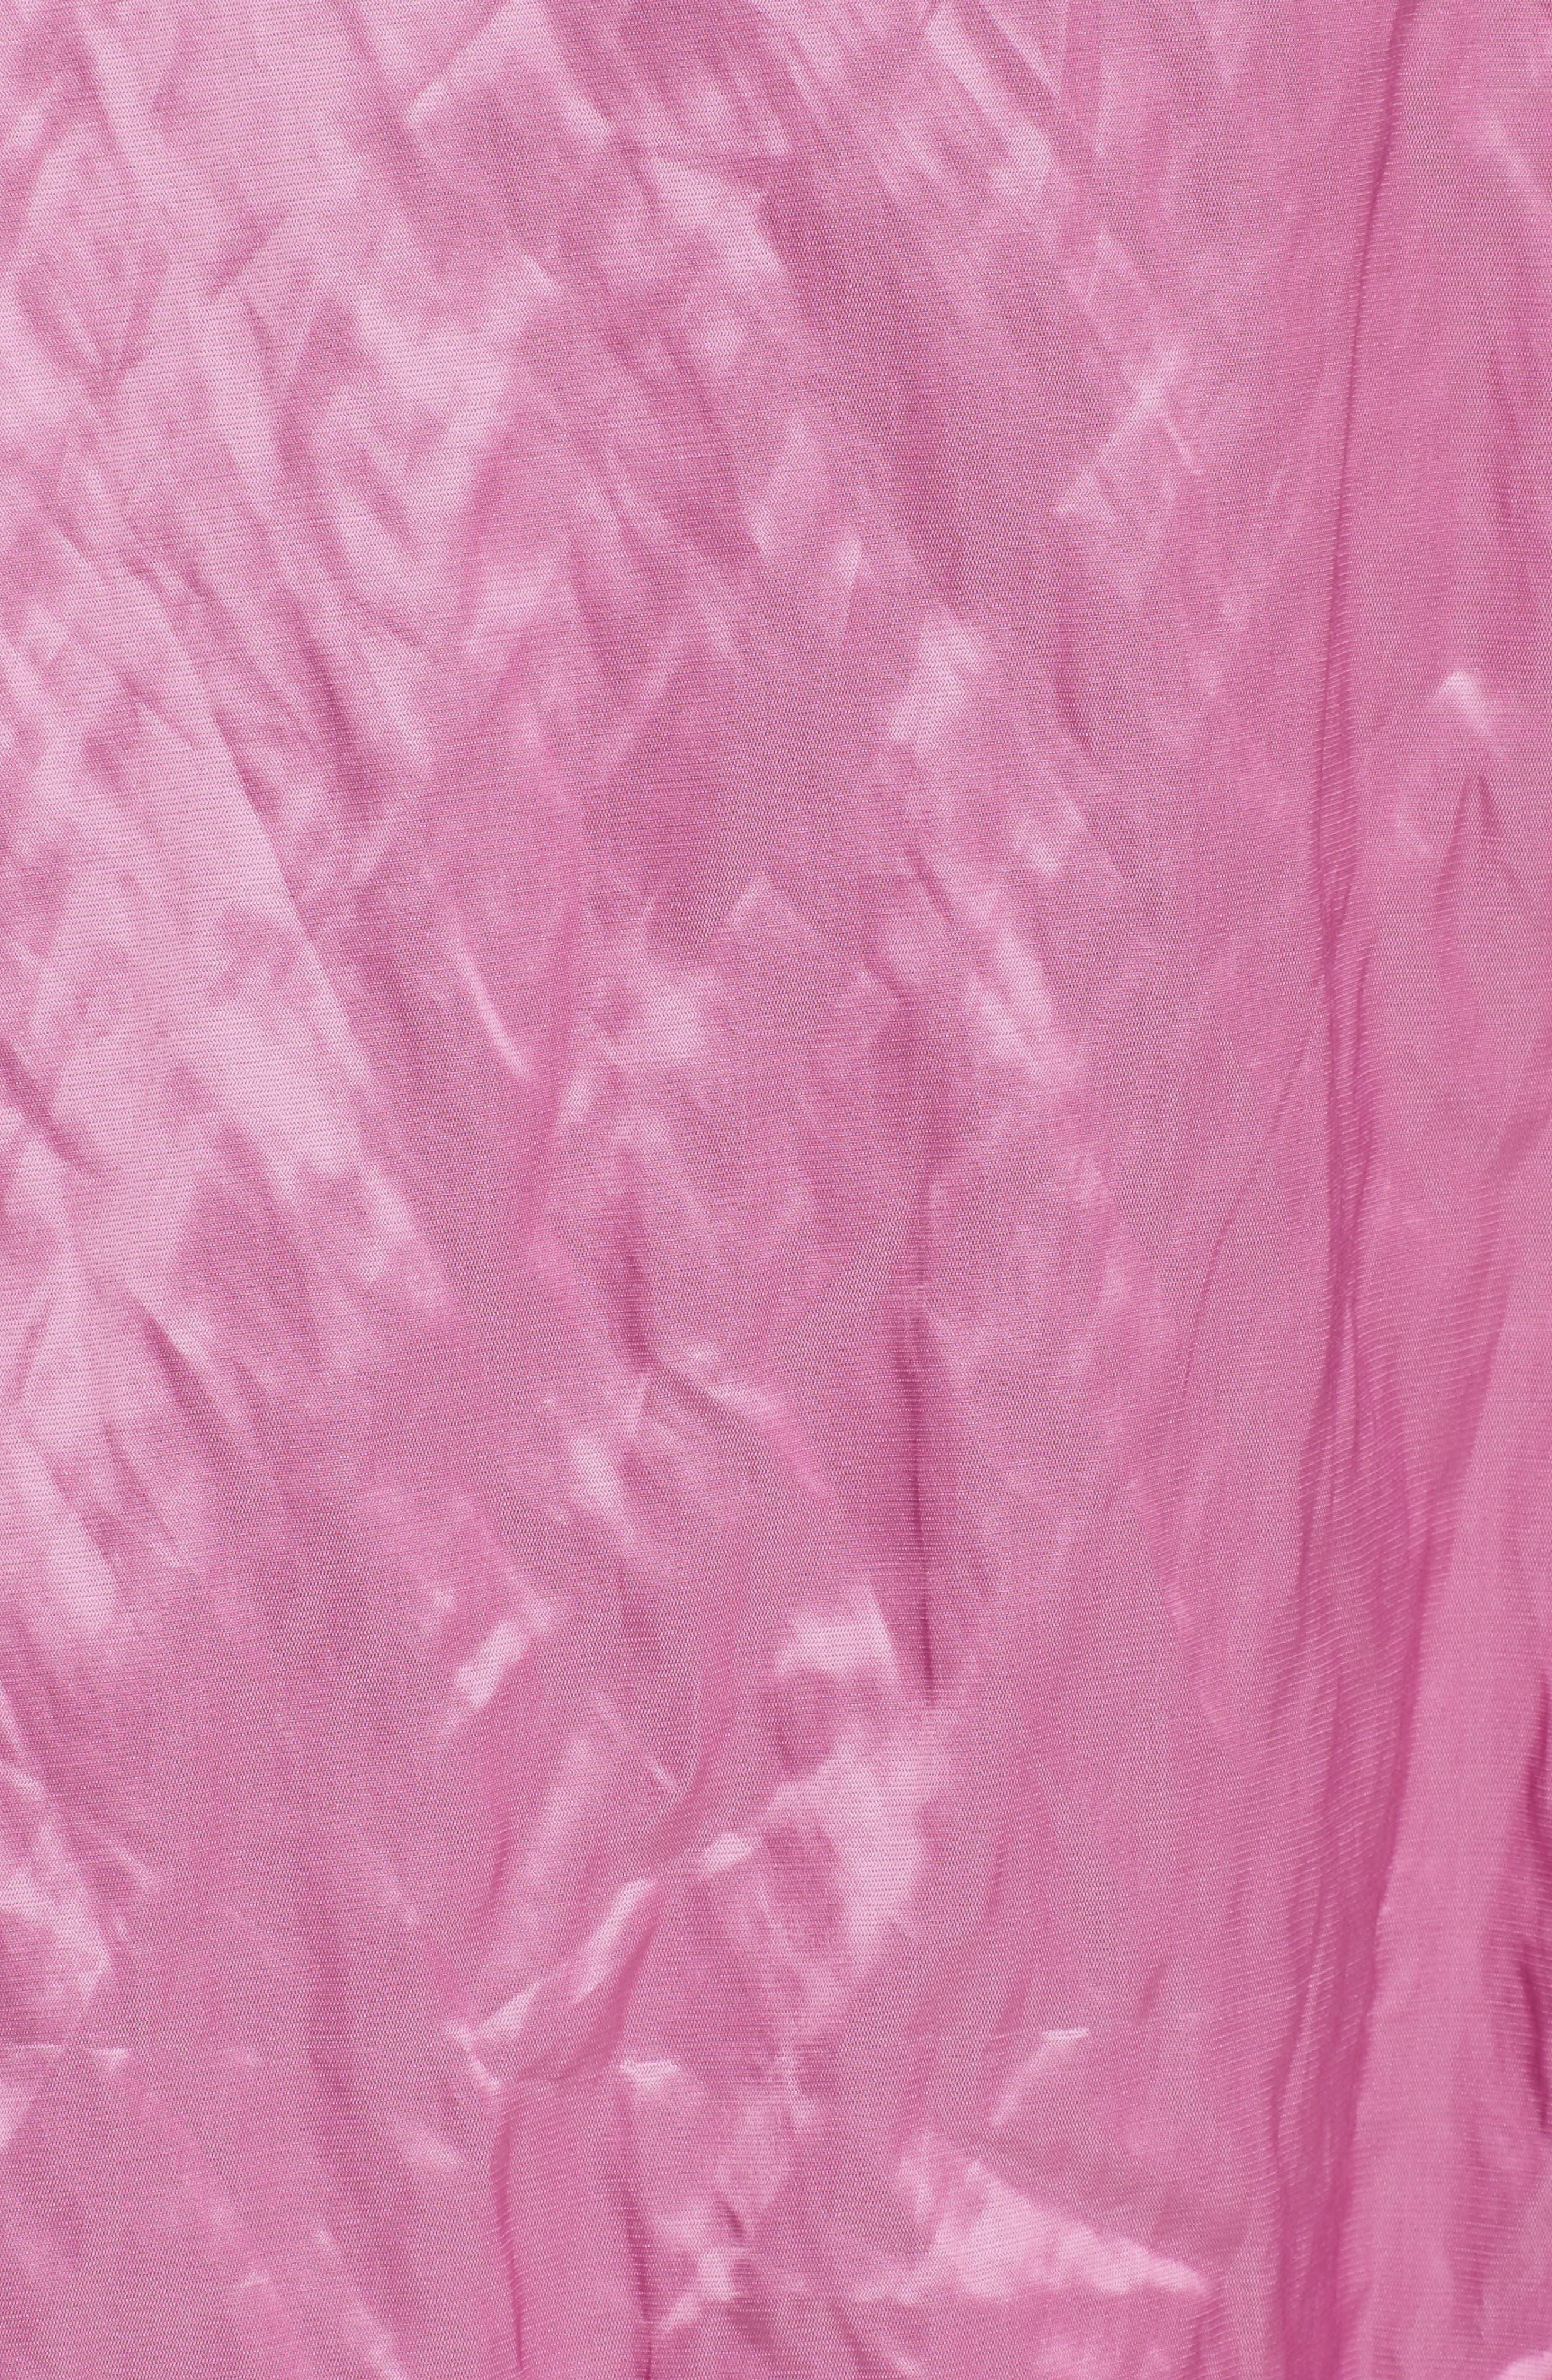 Marques'Almeida Asymmetrical Ruffle Taffeta Skirt,                             Alternate thumbnail 5, color,                             650